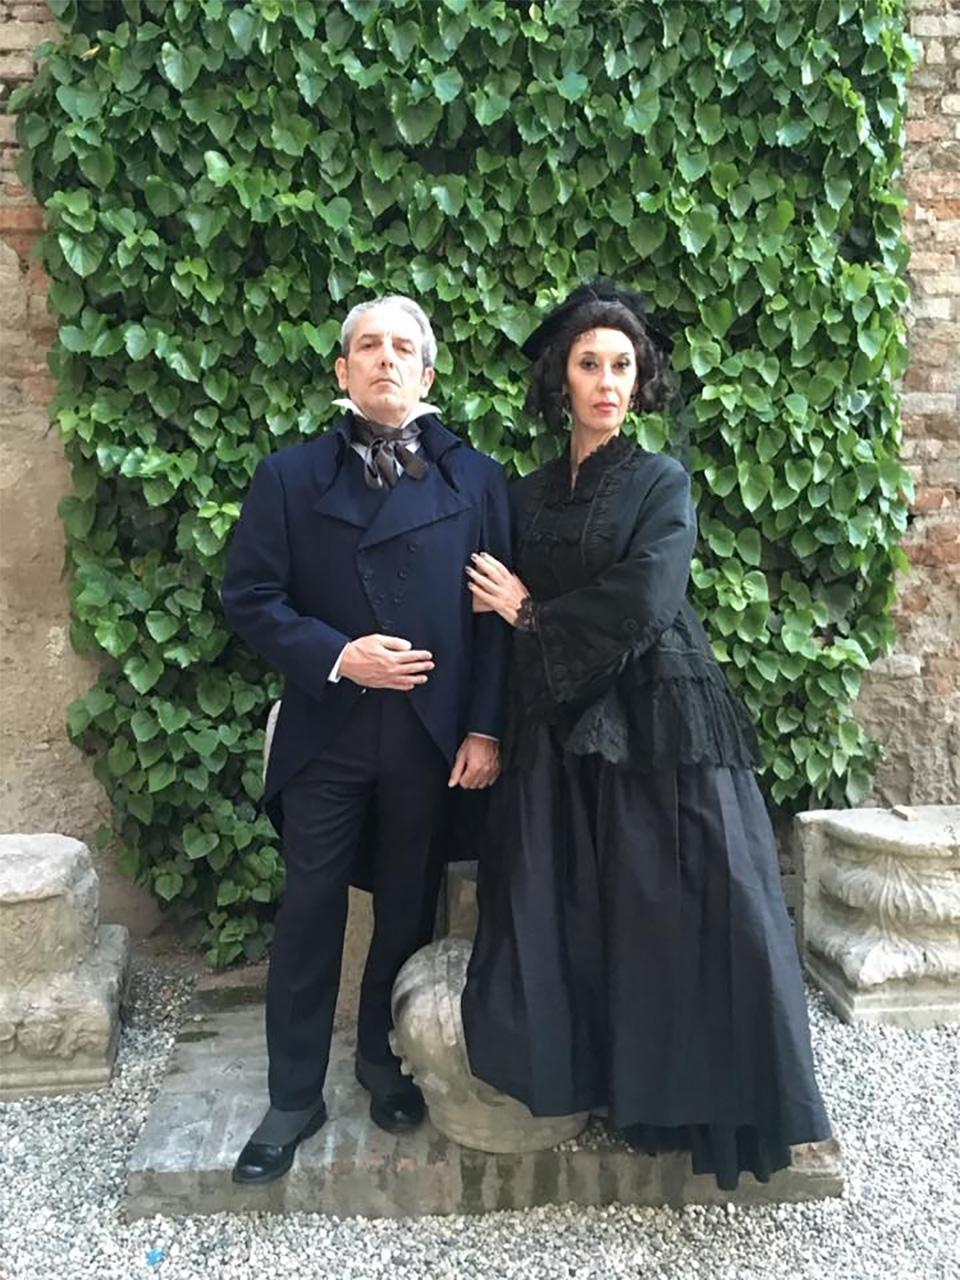 Baracca & Burattini